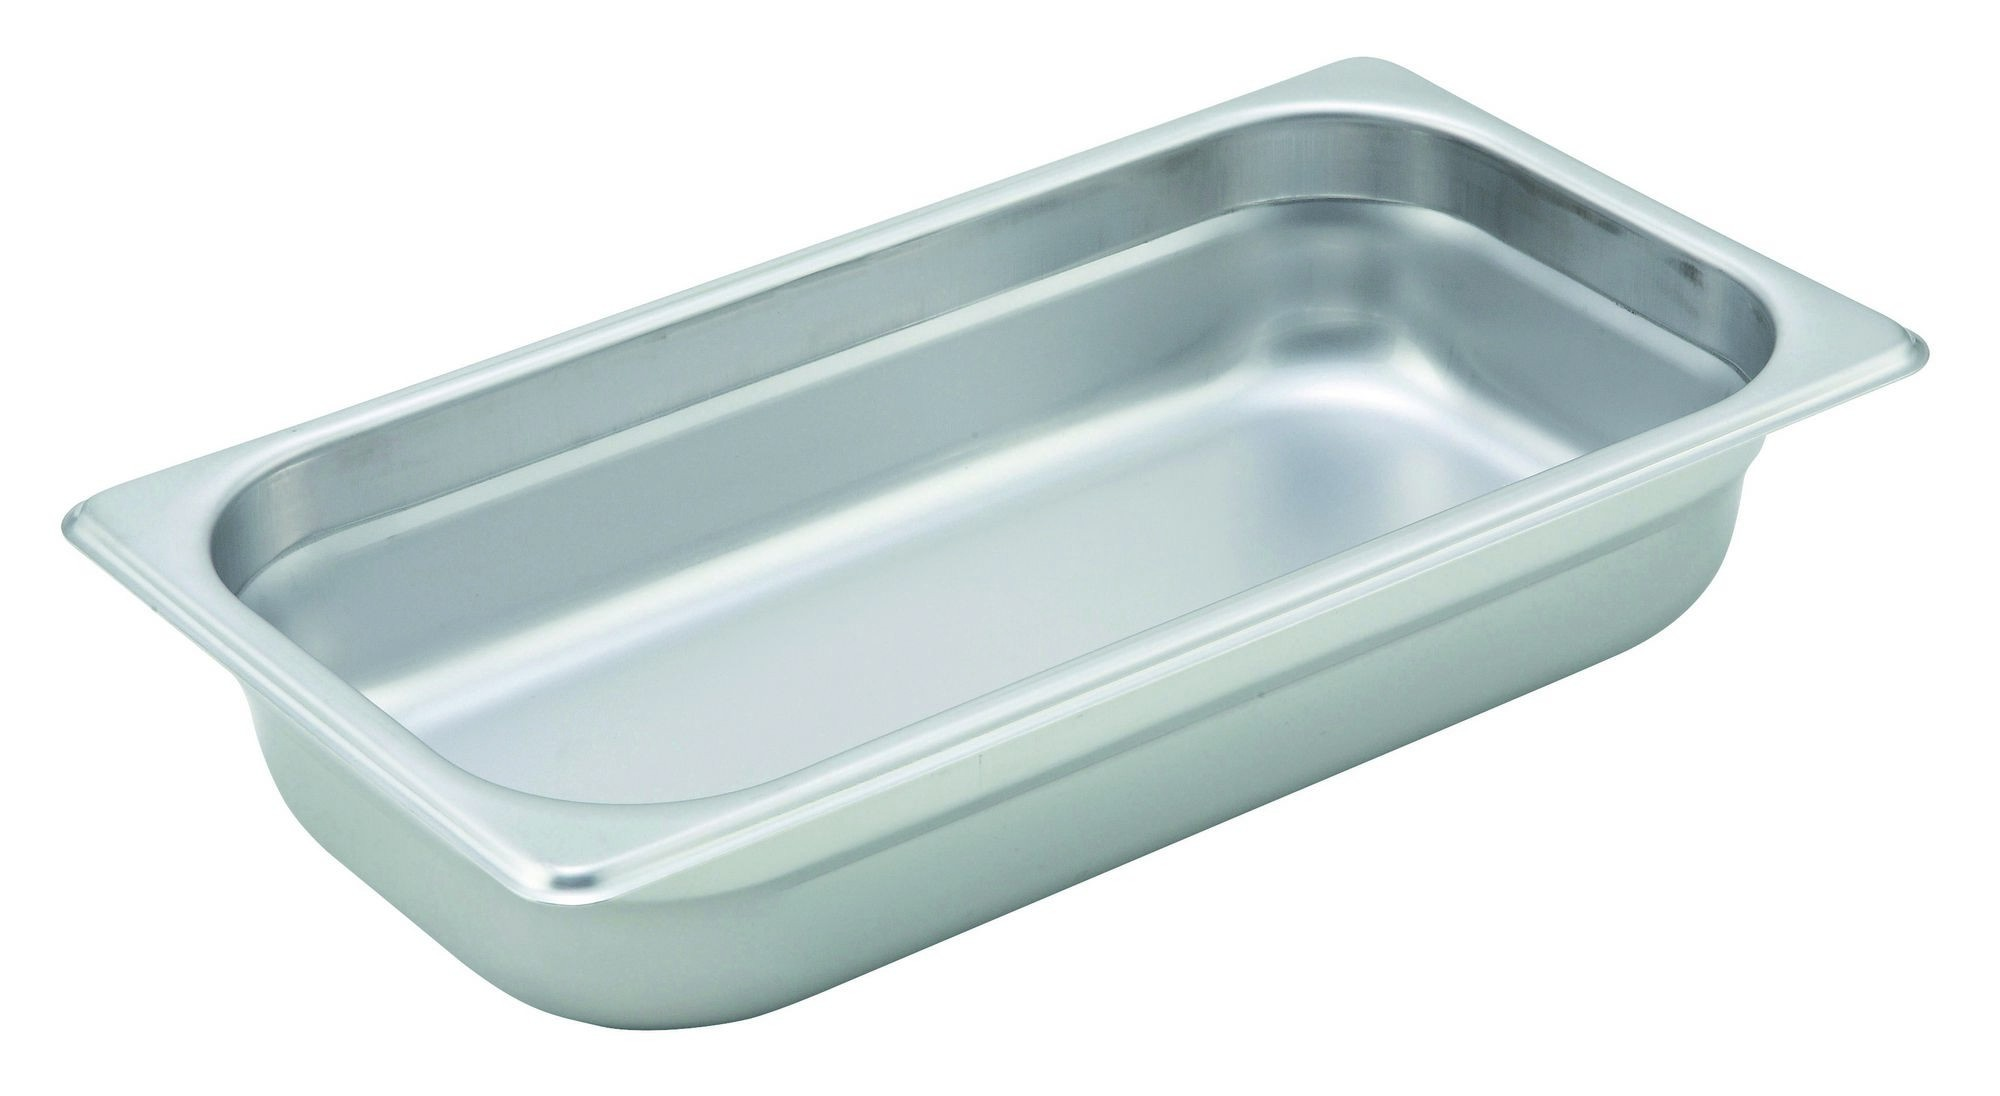 "Winco SPJH-302 1/3 Size Anti-Jam 22 Gauge Steam Table Pan 2-1/2"" Deep"